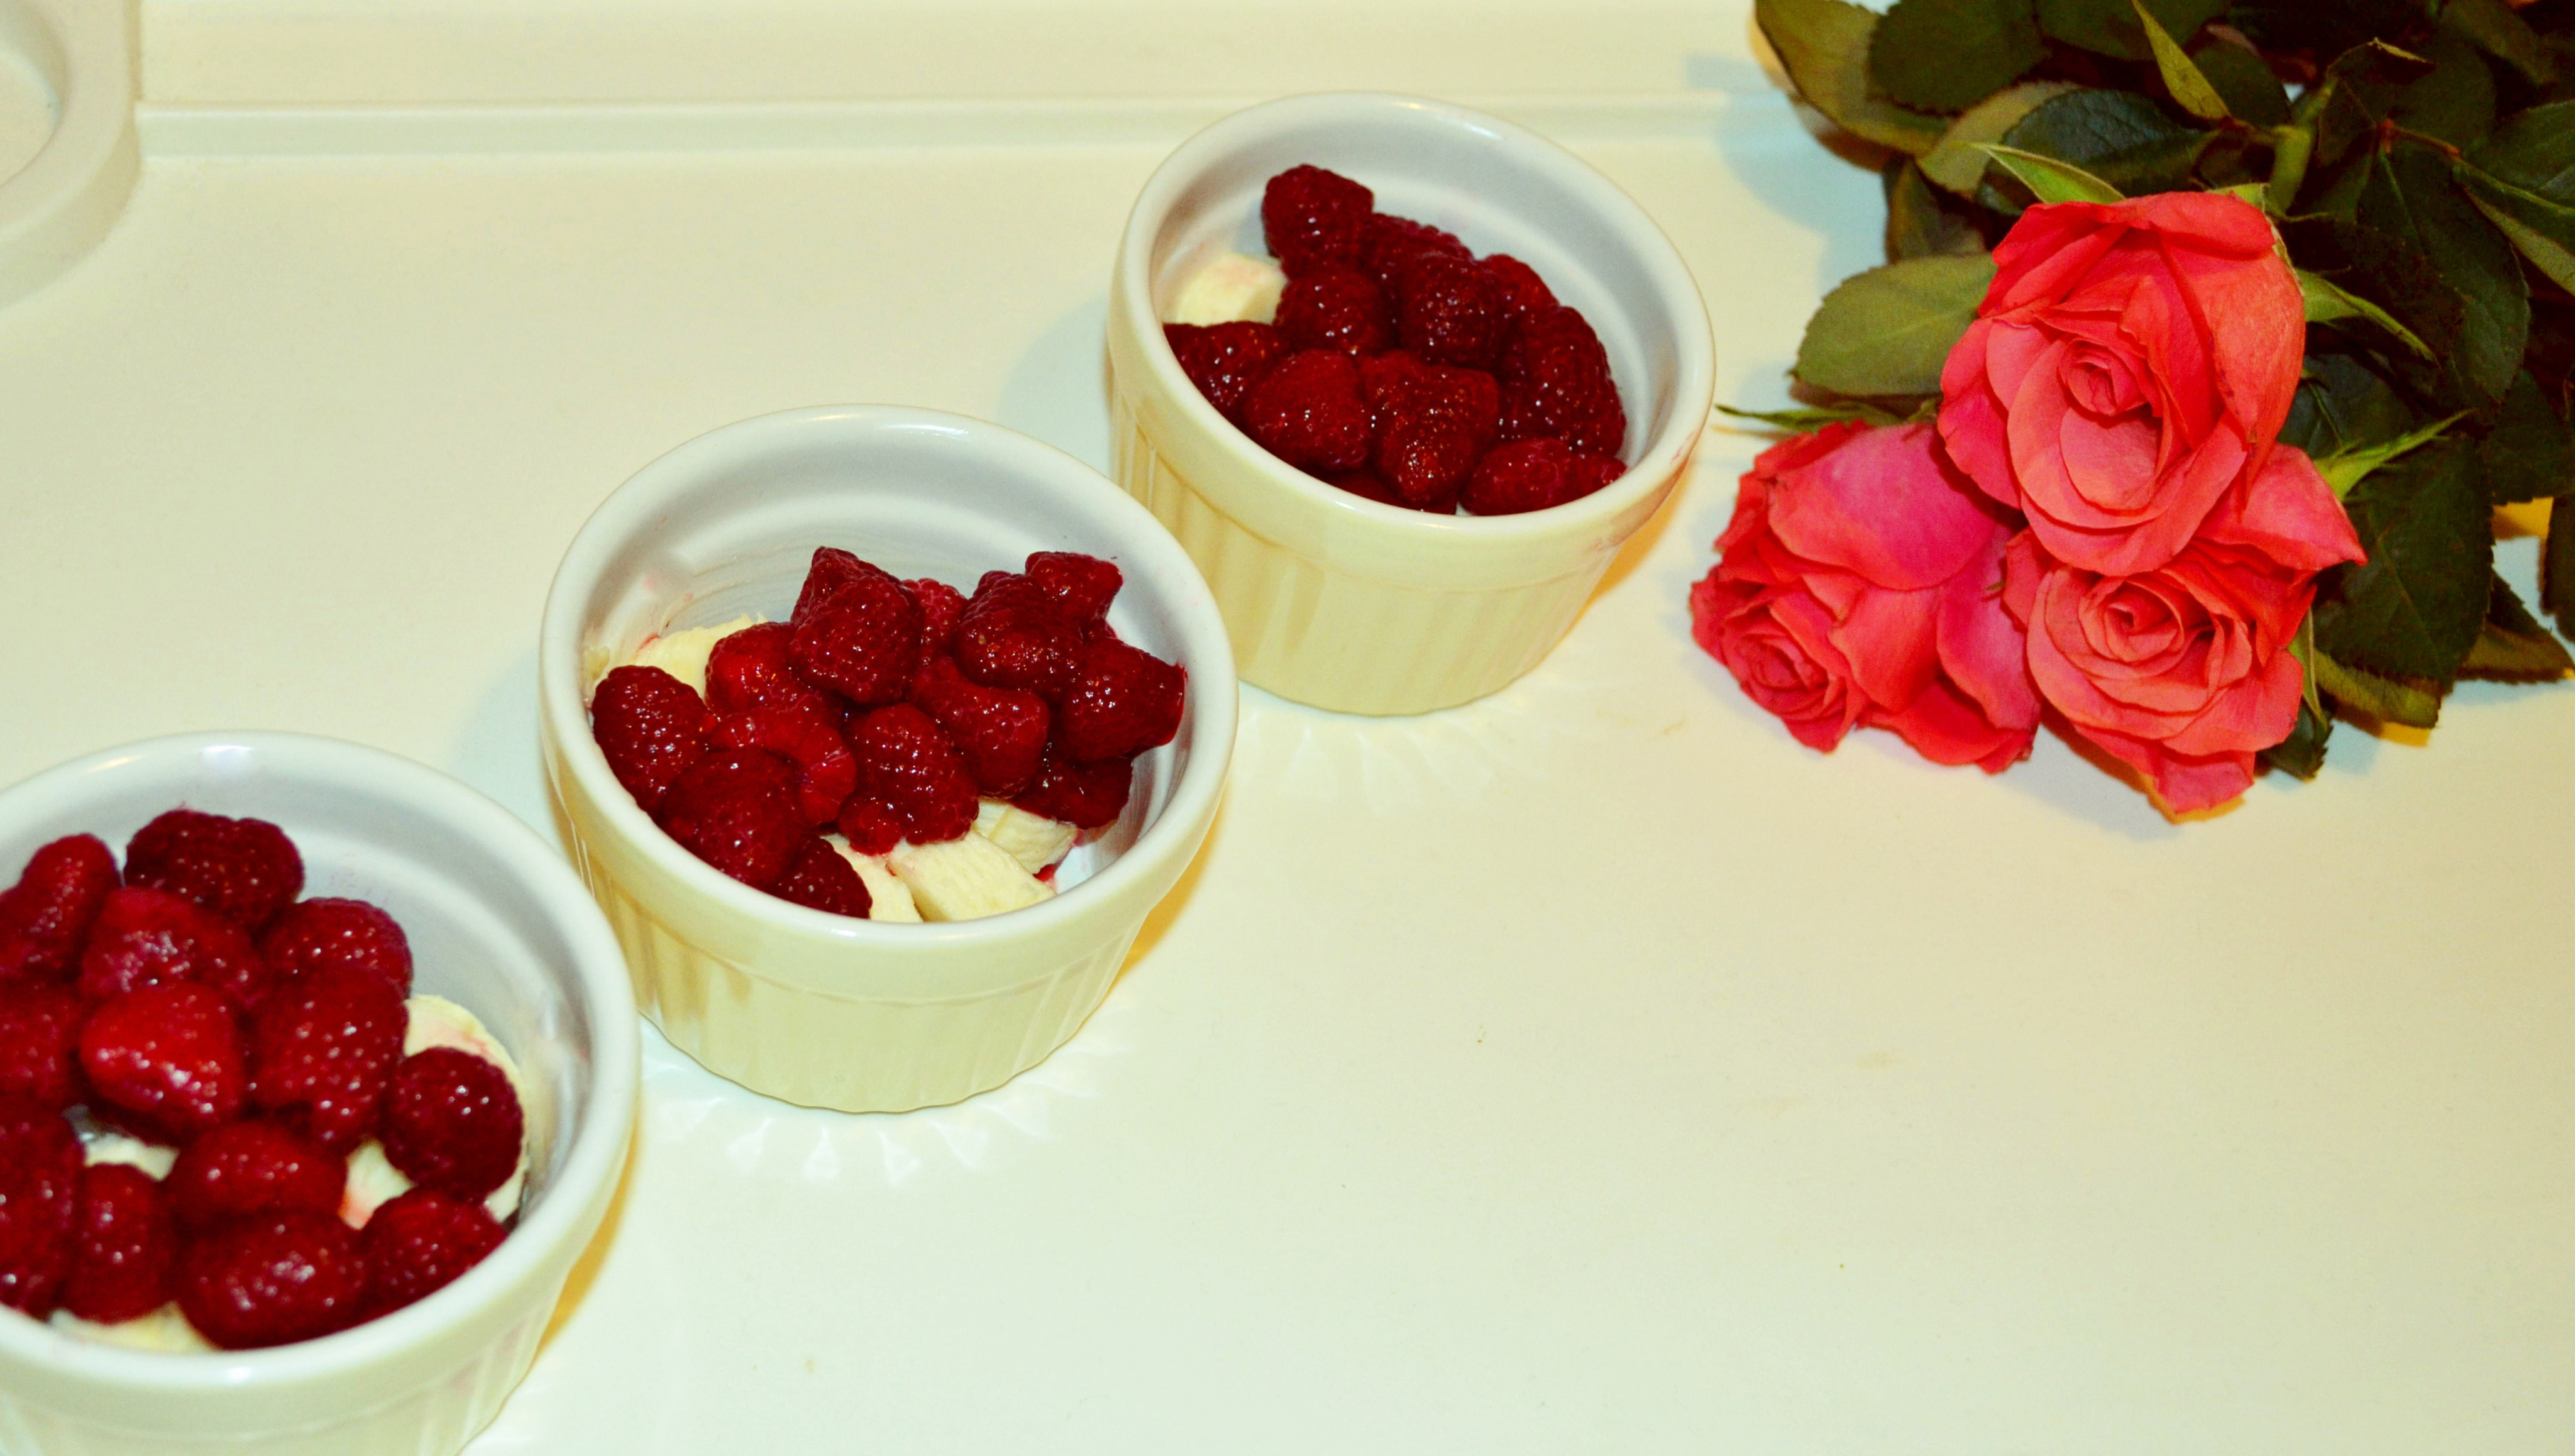 Raspberries and banana crumble with orange ice-cream!